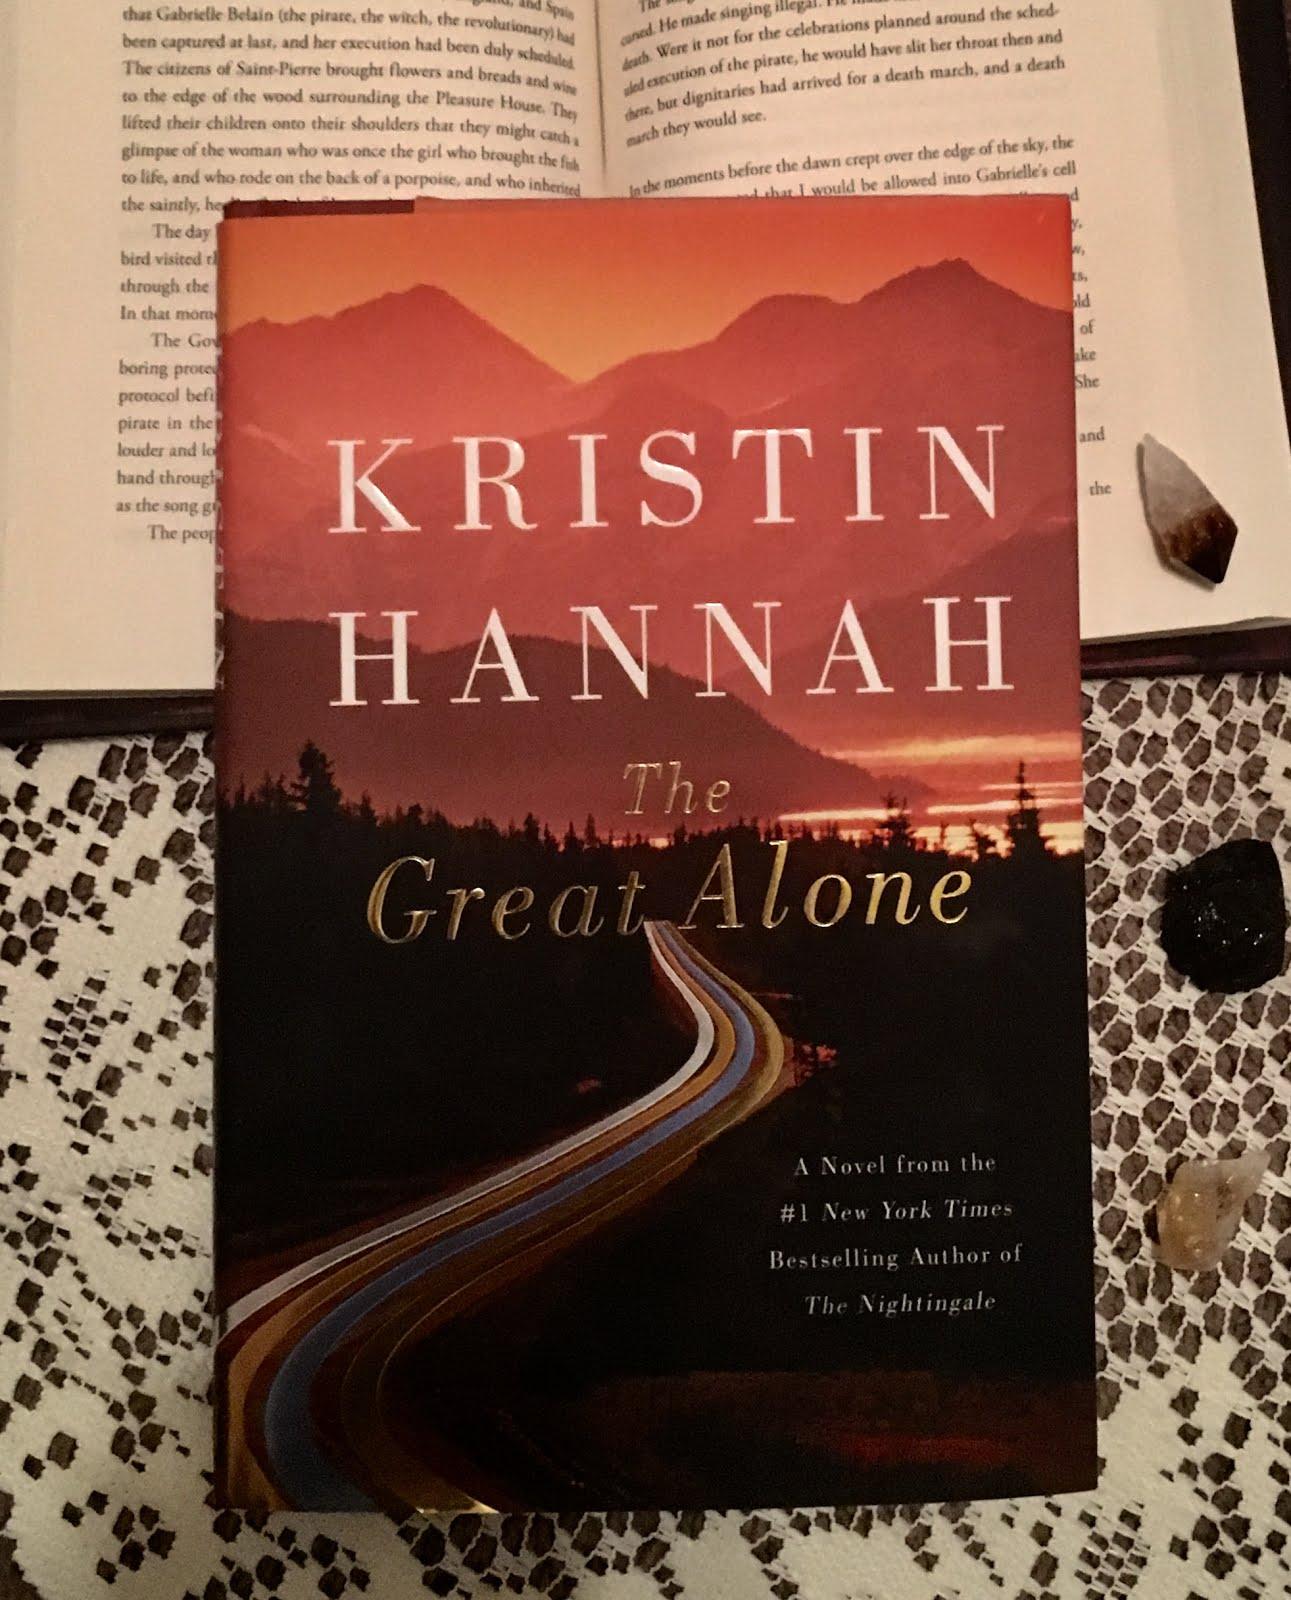 kristin hannah books new